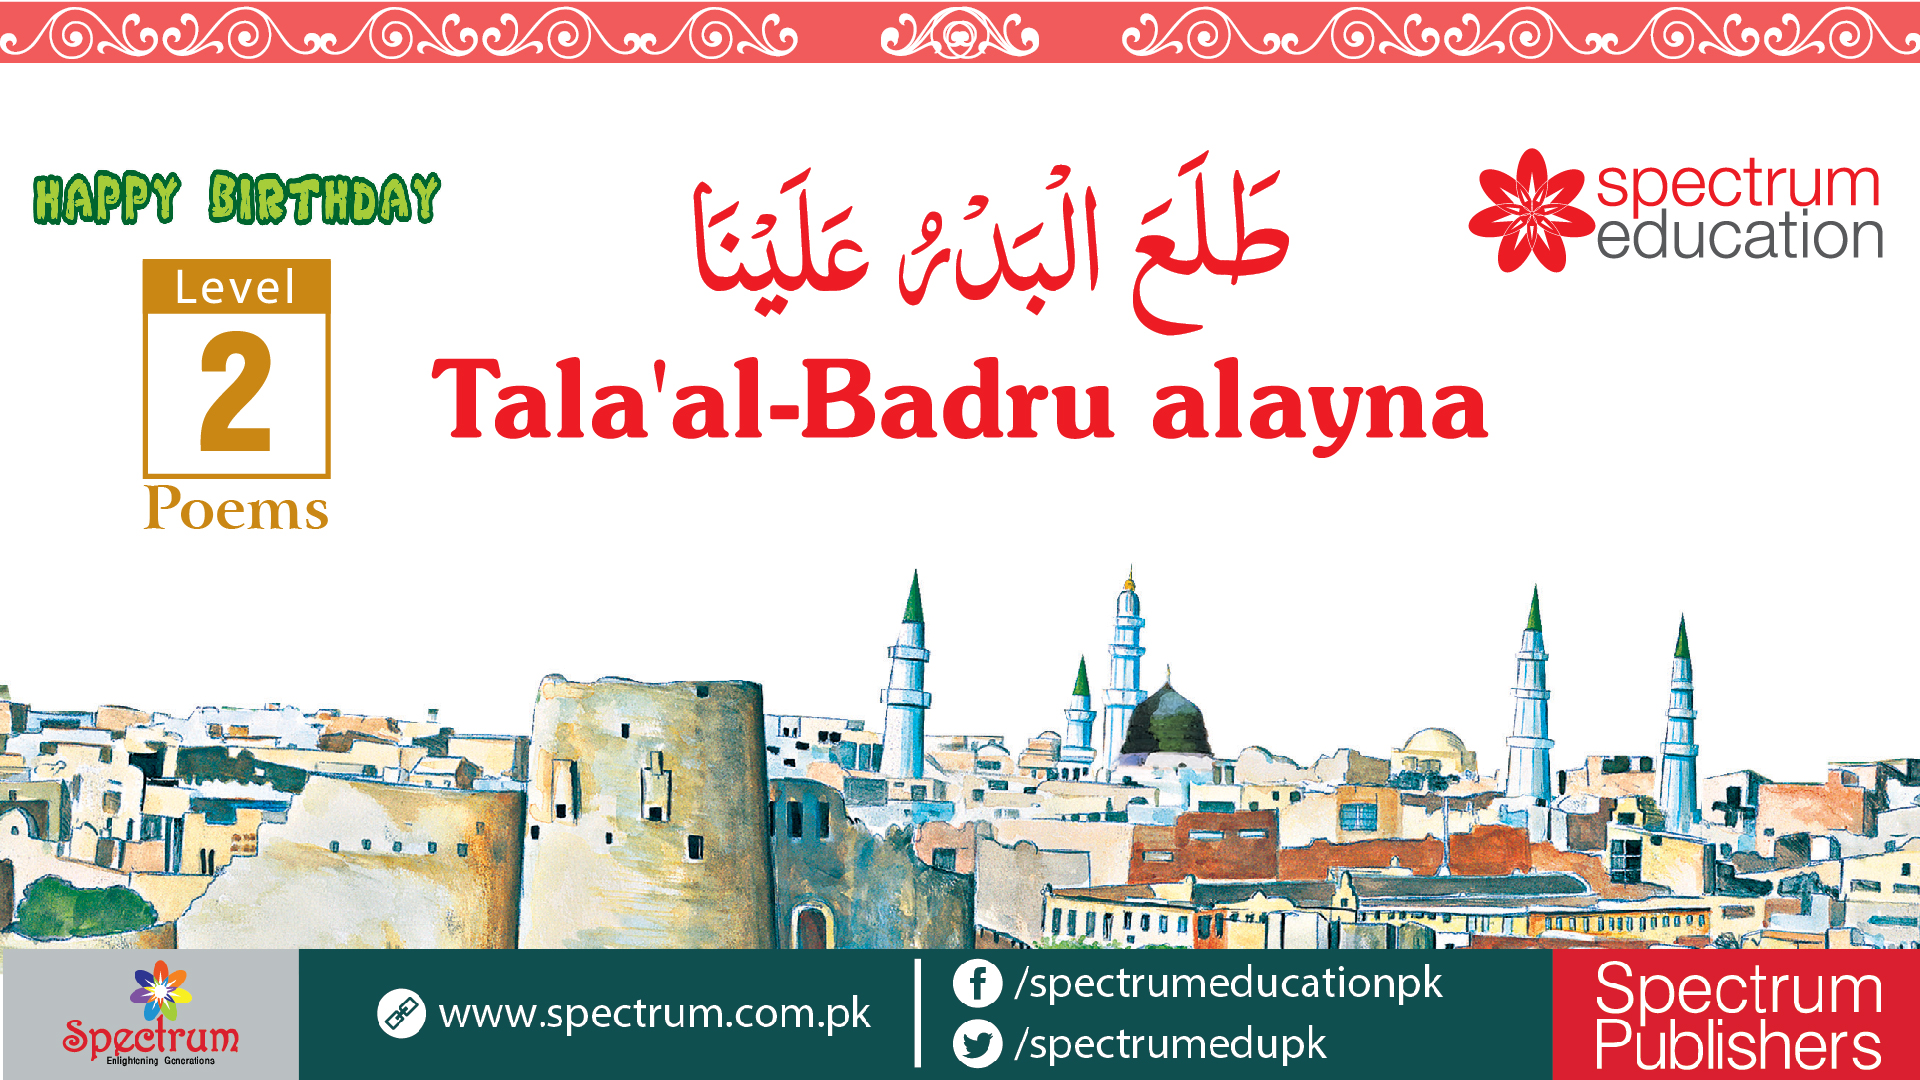 Tala al Badru Alaina